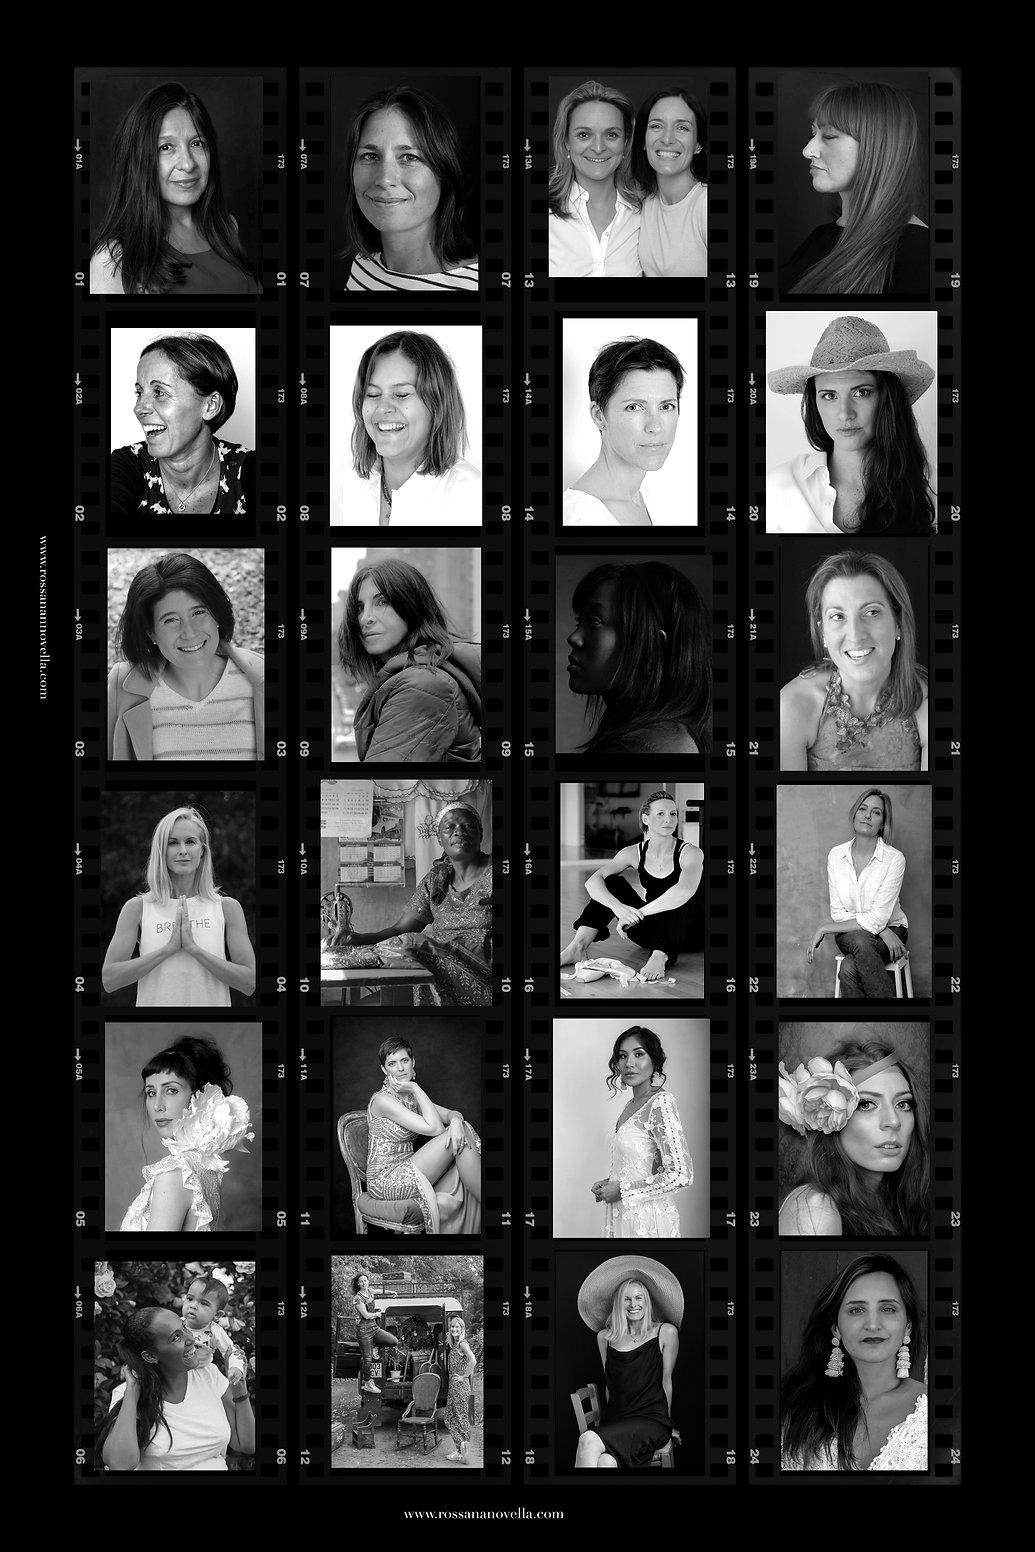 CONTACT SHEET MUJERES- 35mm Film Negati